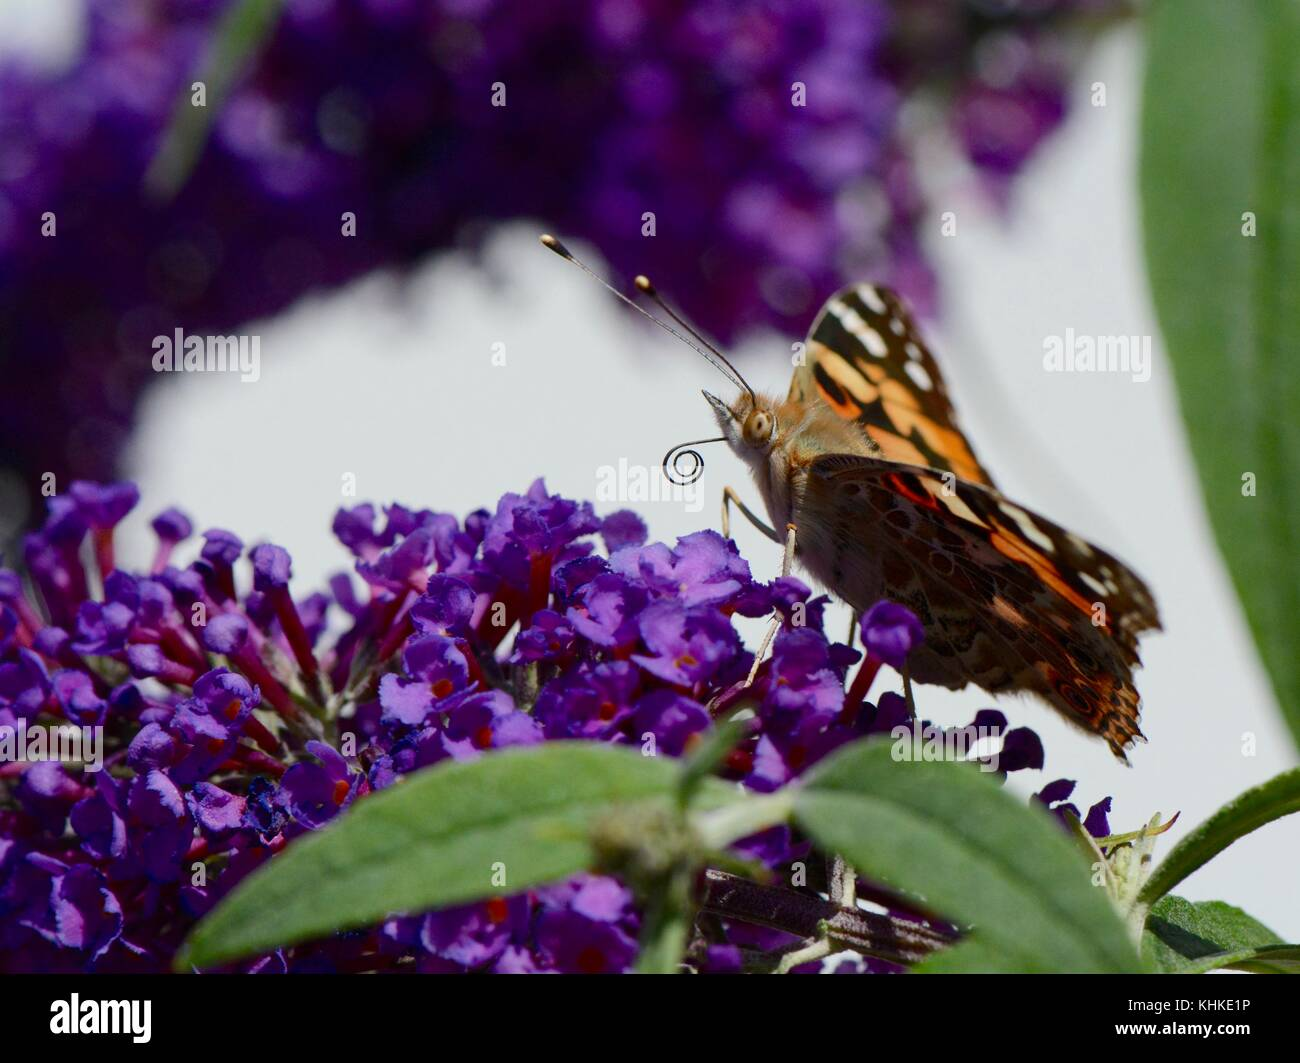 Anthropocene effect on pollinators - Stock Image